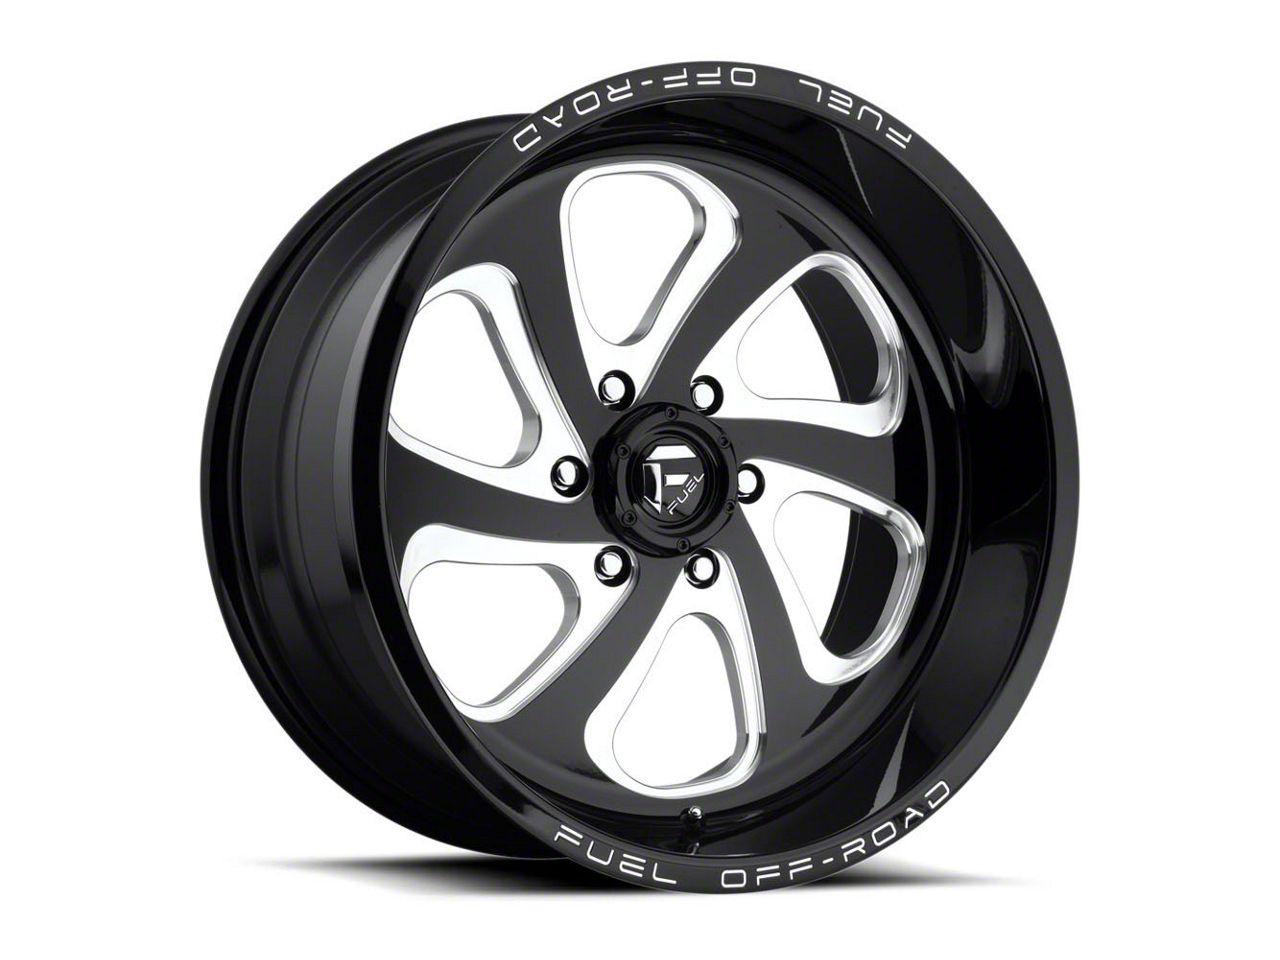 Fuel Wheels Flow Gloss Black Milled 6-Lug Wheel - 20x12 (04-18 F-150)